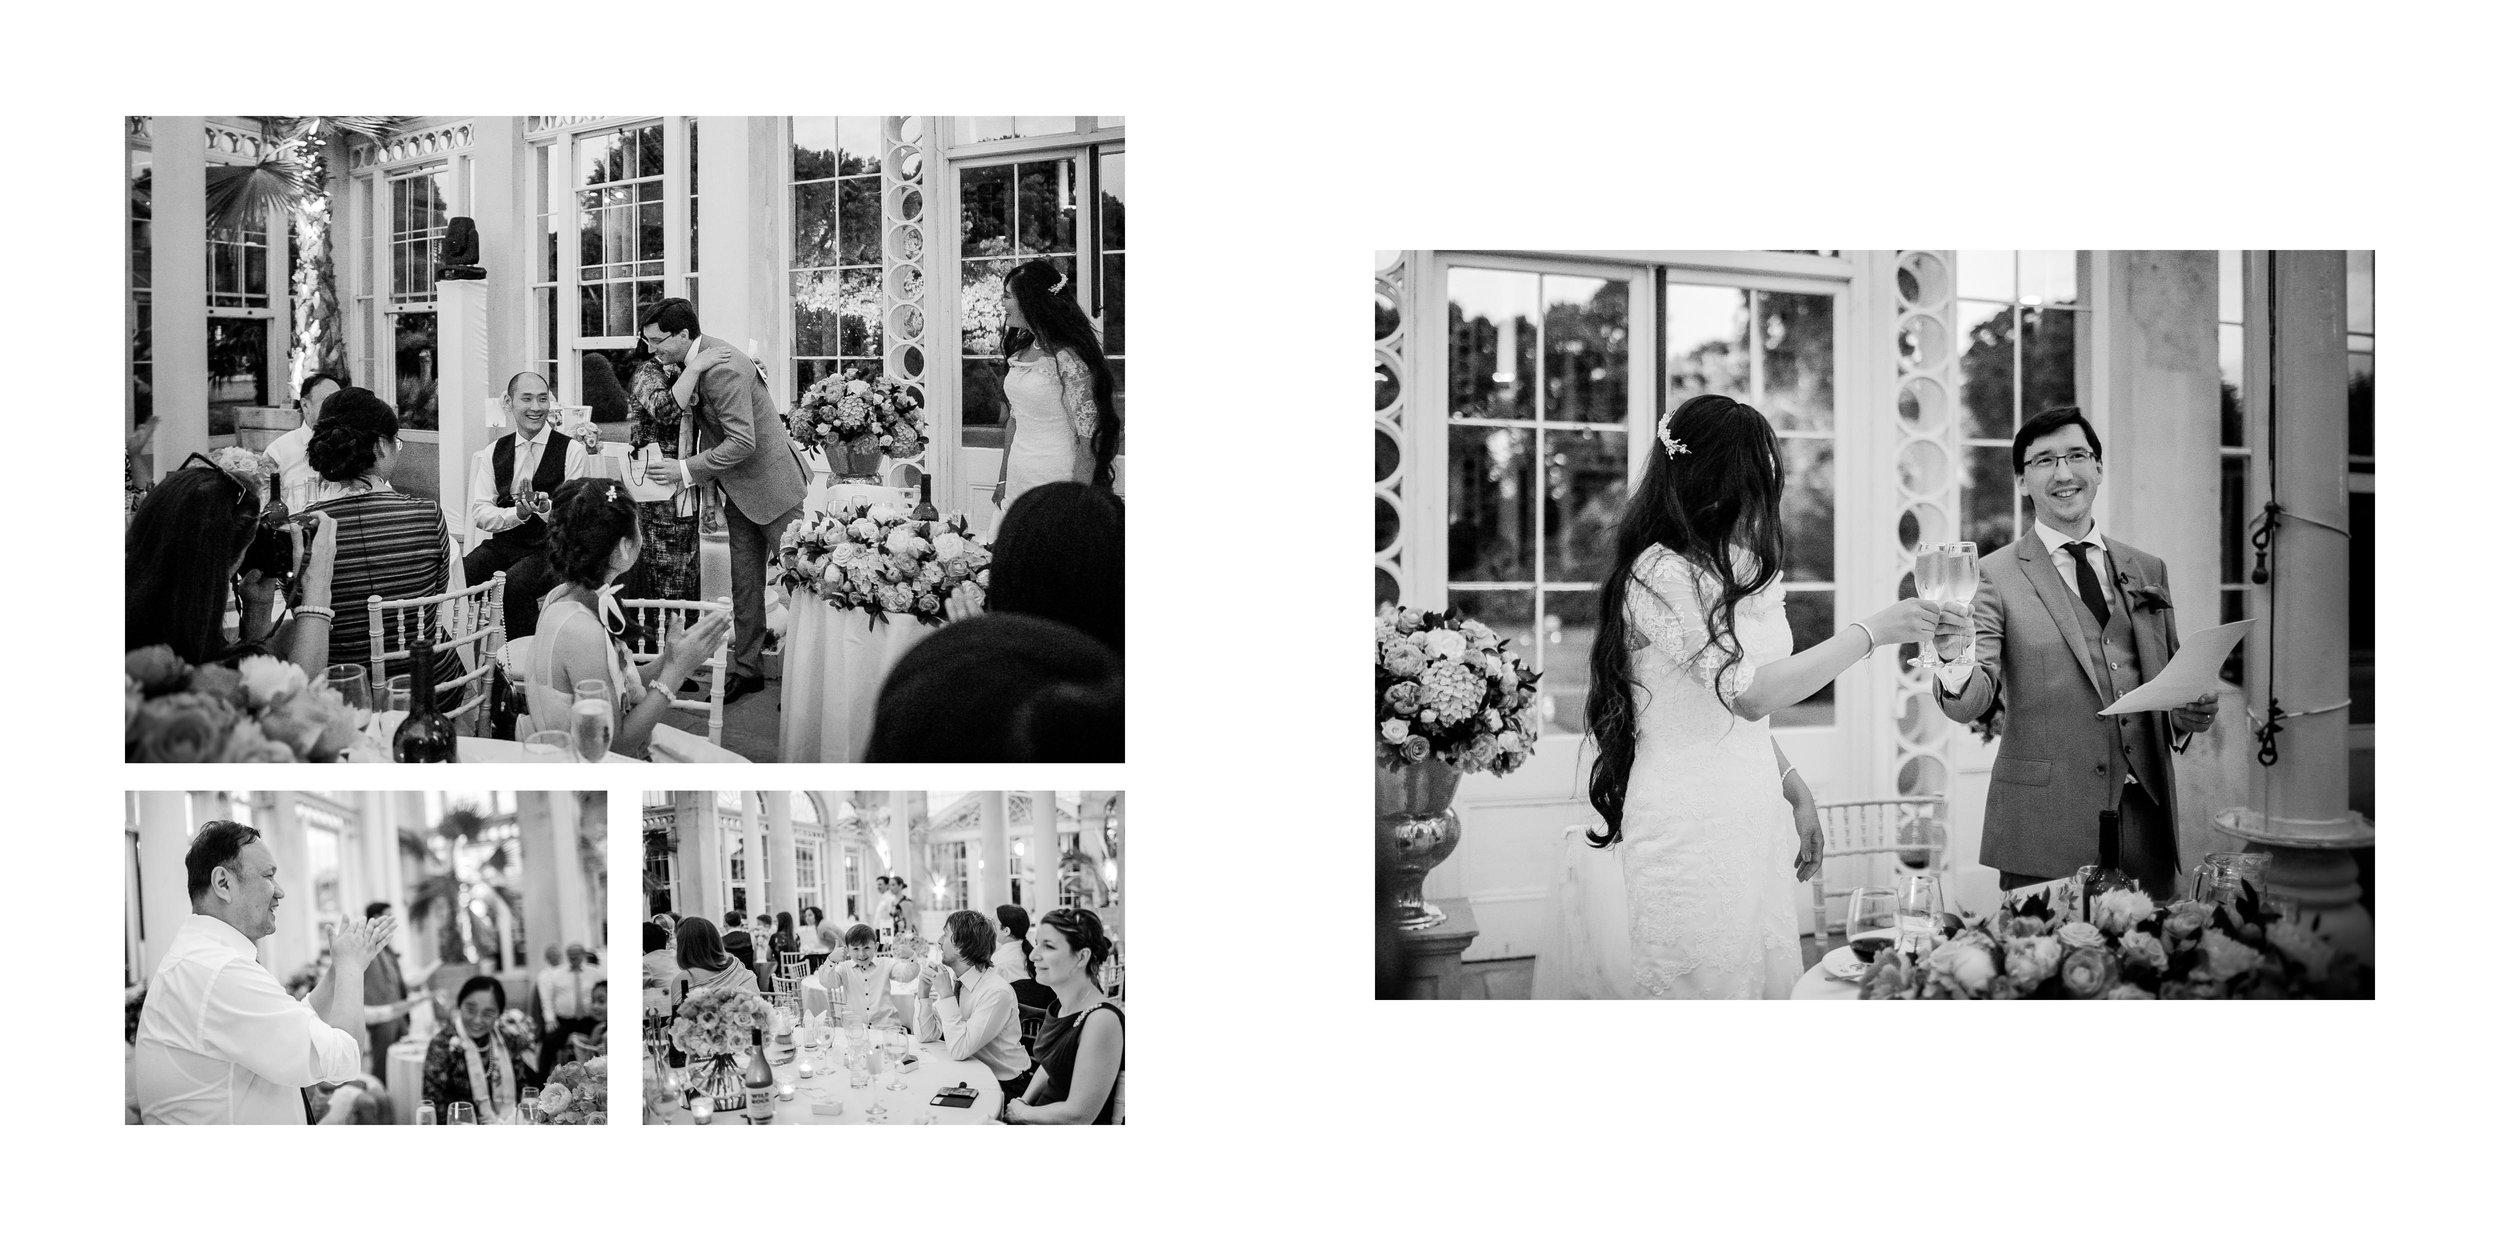 wedding_photographer_surrey_61.jpg